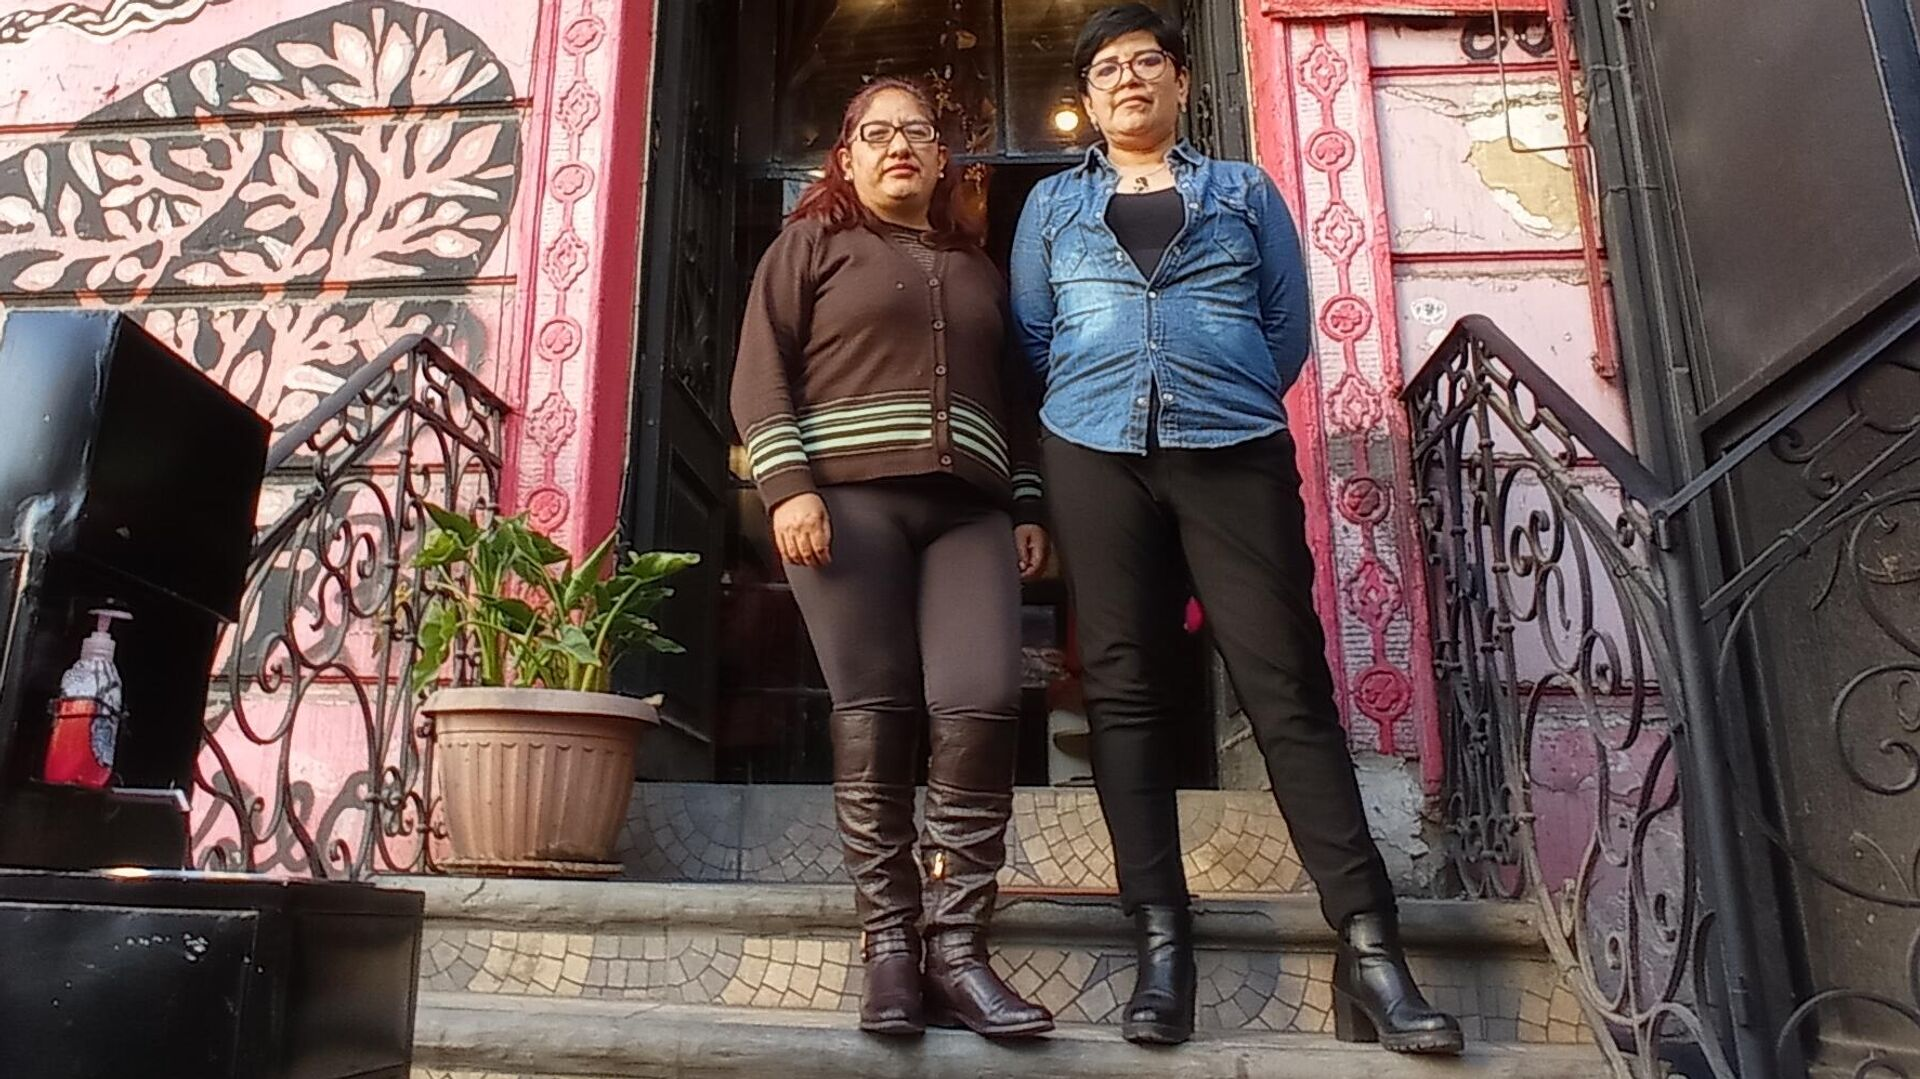 Paola Gutiérrez y Heydi Gil - Sputnik Mundo, 1920, 29.07.2021